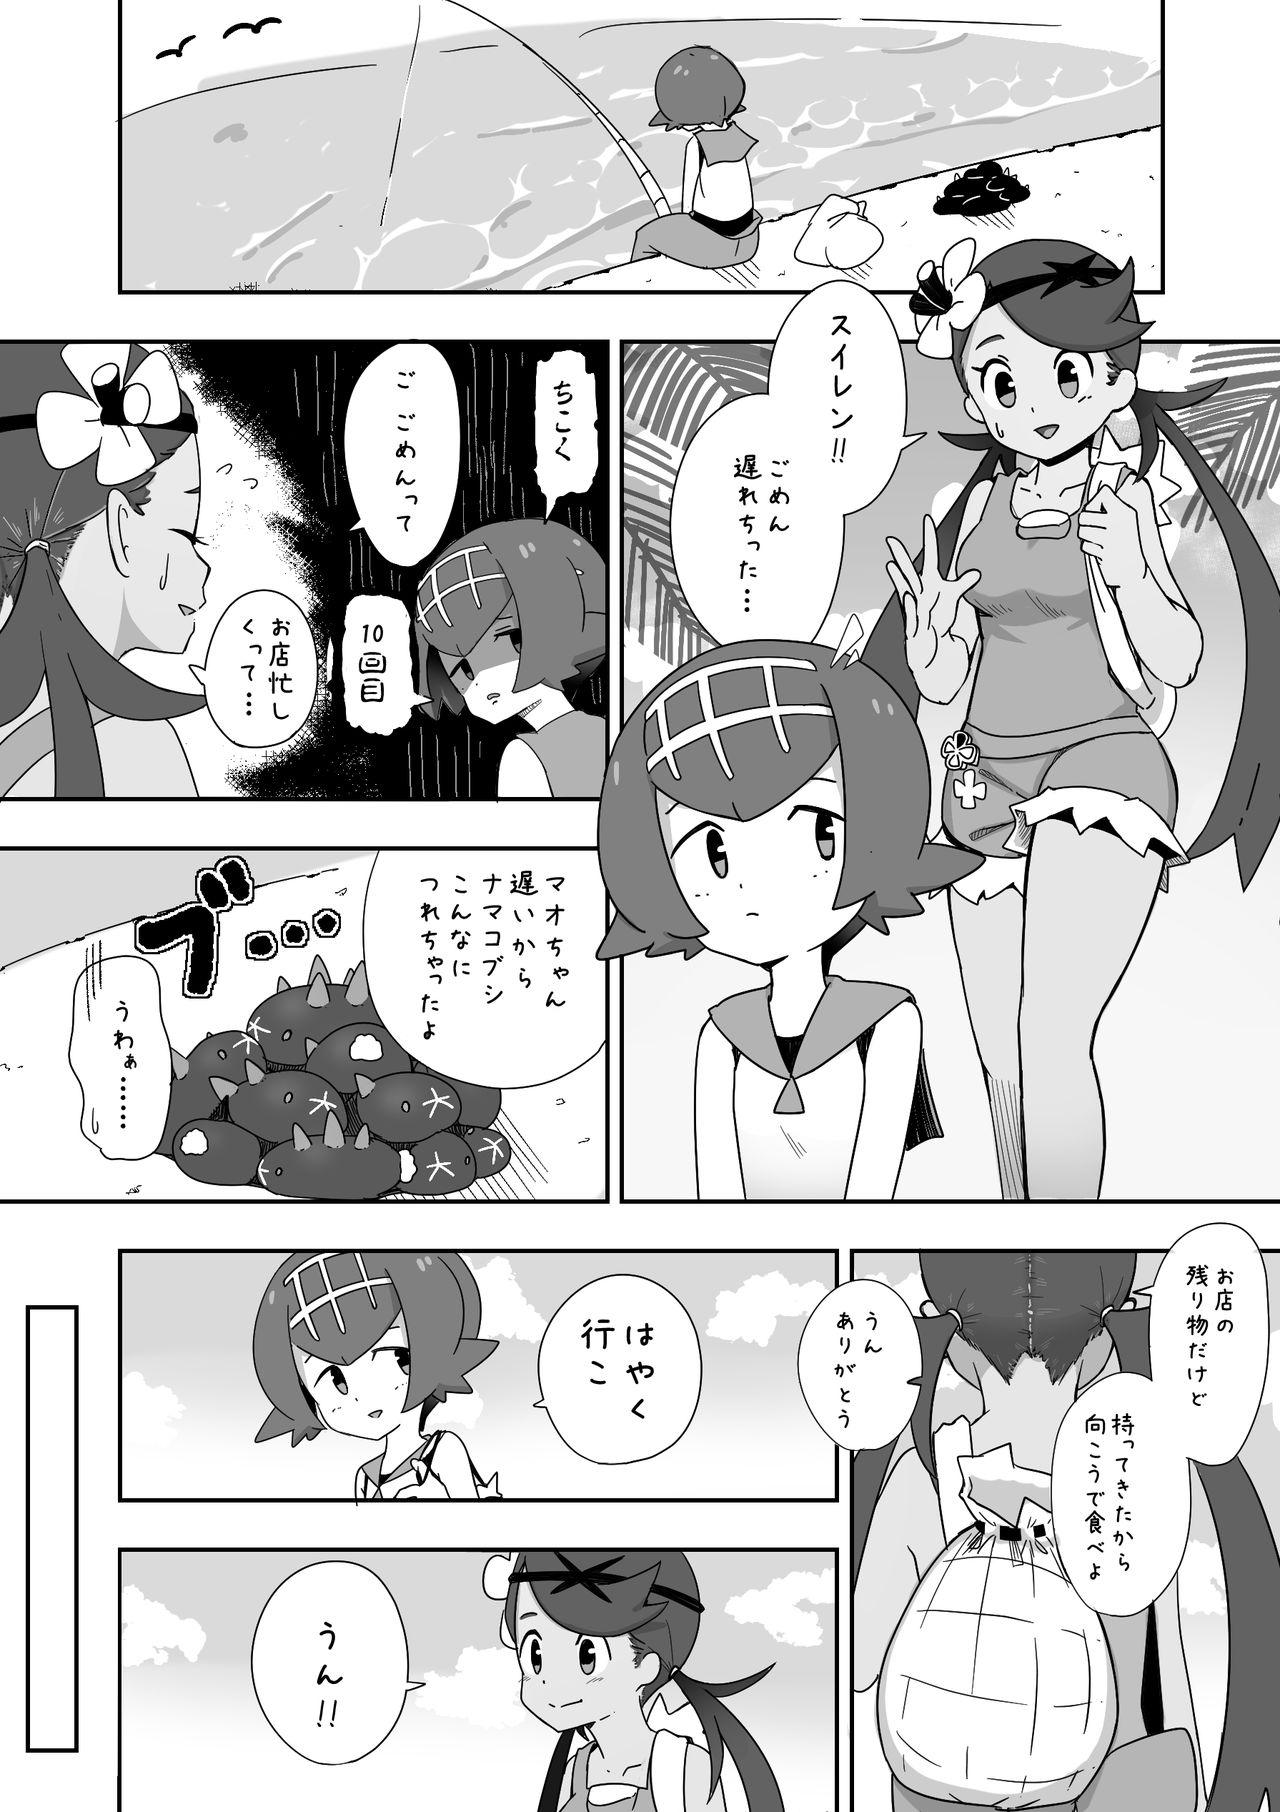 Hentai pokemon comic